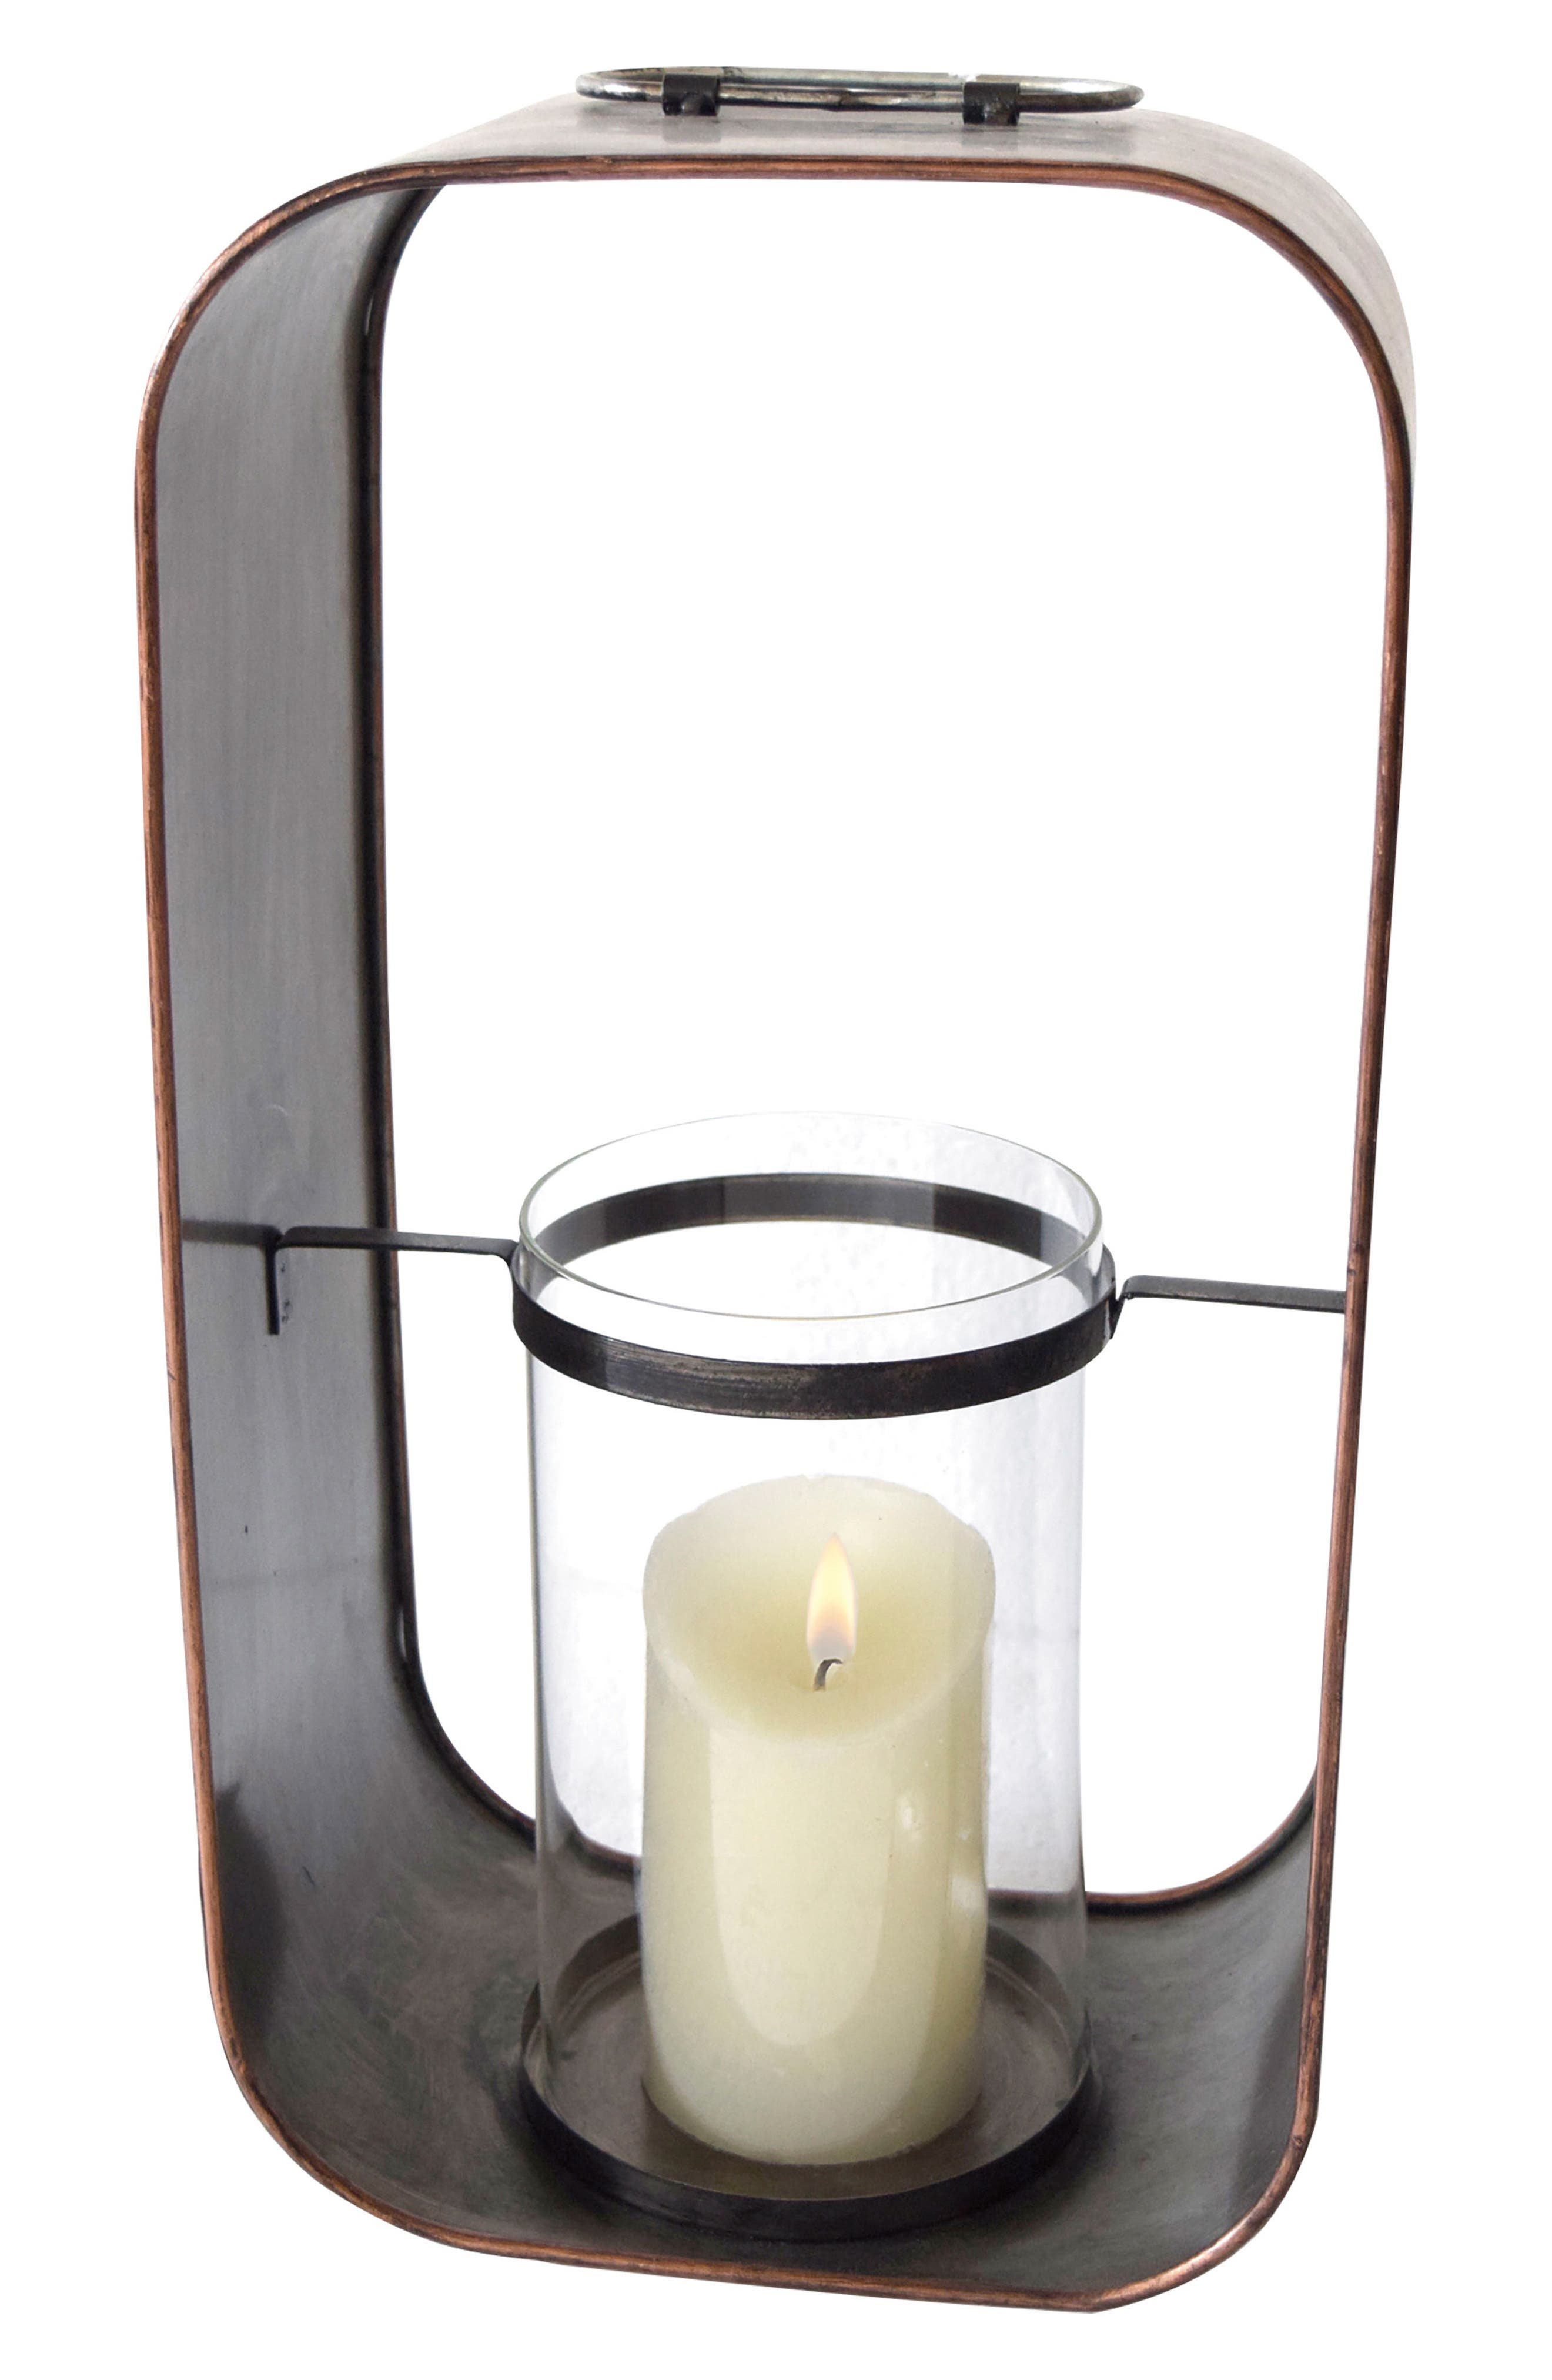 Main Image - Foreside Barn Votive Candle Holder